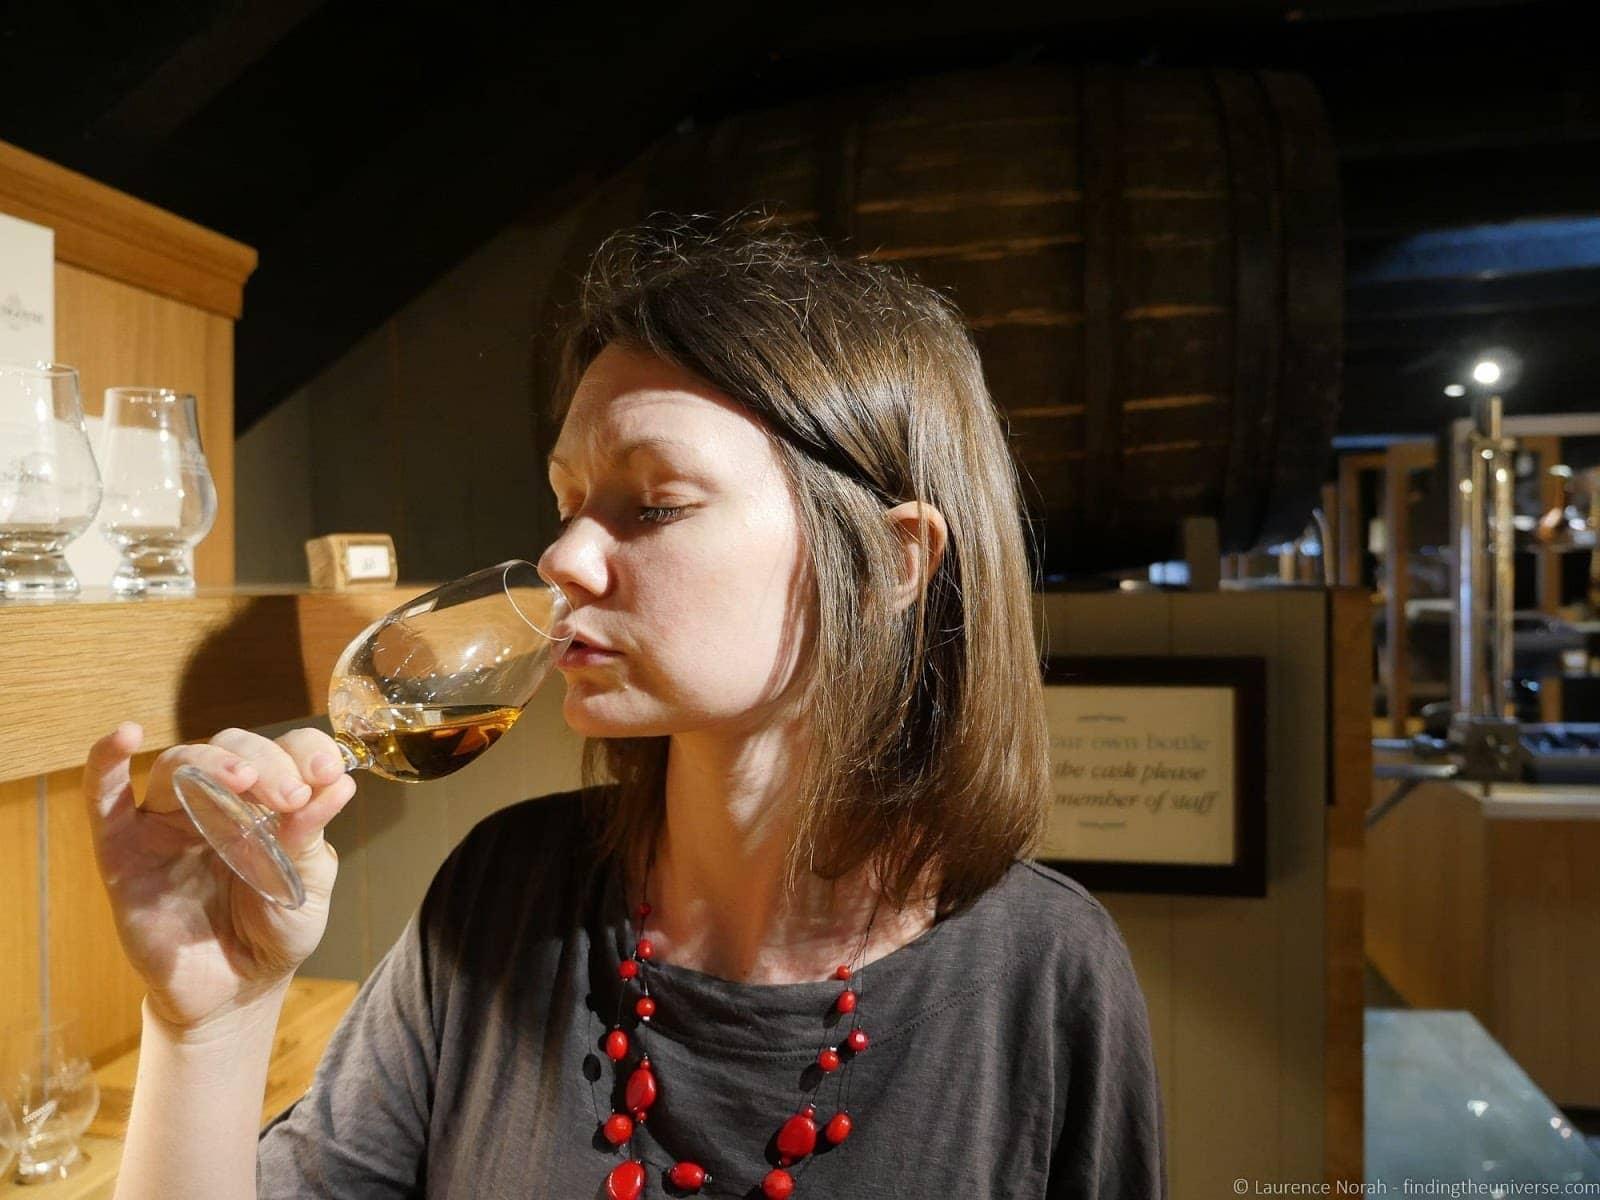 Jess drinking whiskey